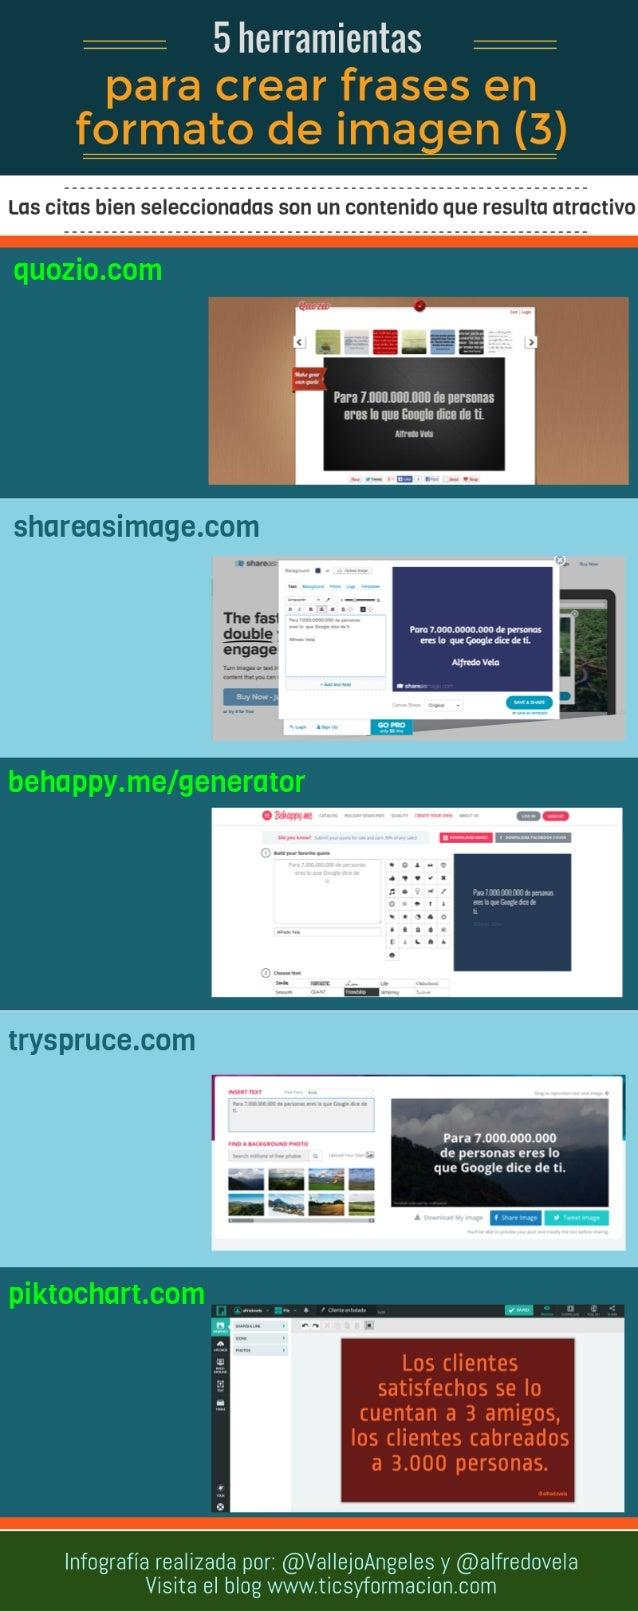 5 herramientas  Para 7.000.000.000 de uersnnas eres In que Google dice de ti.   l' eine;   shareasimage. com  ¡dunas-  dou...